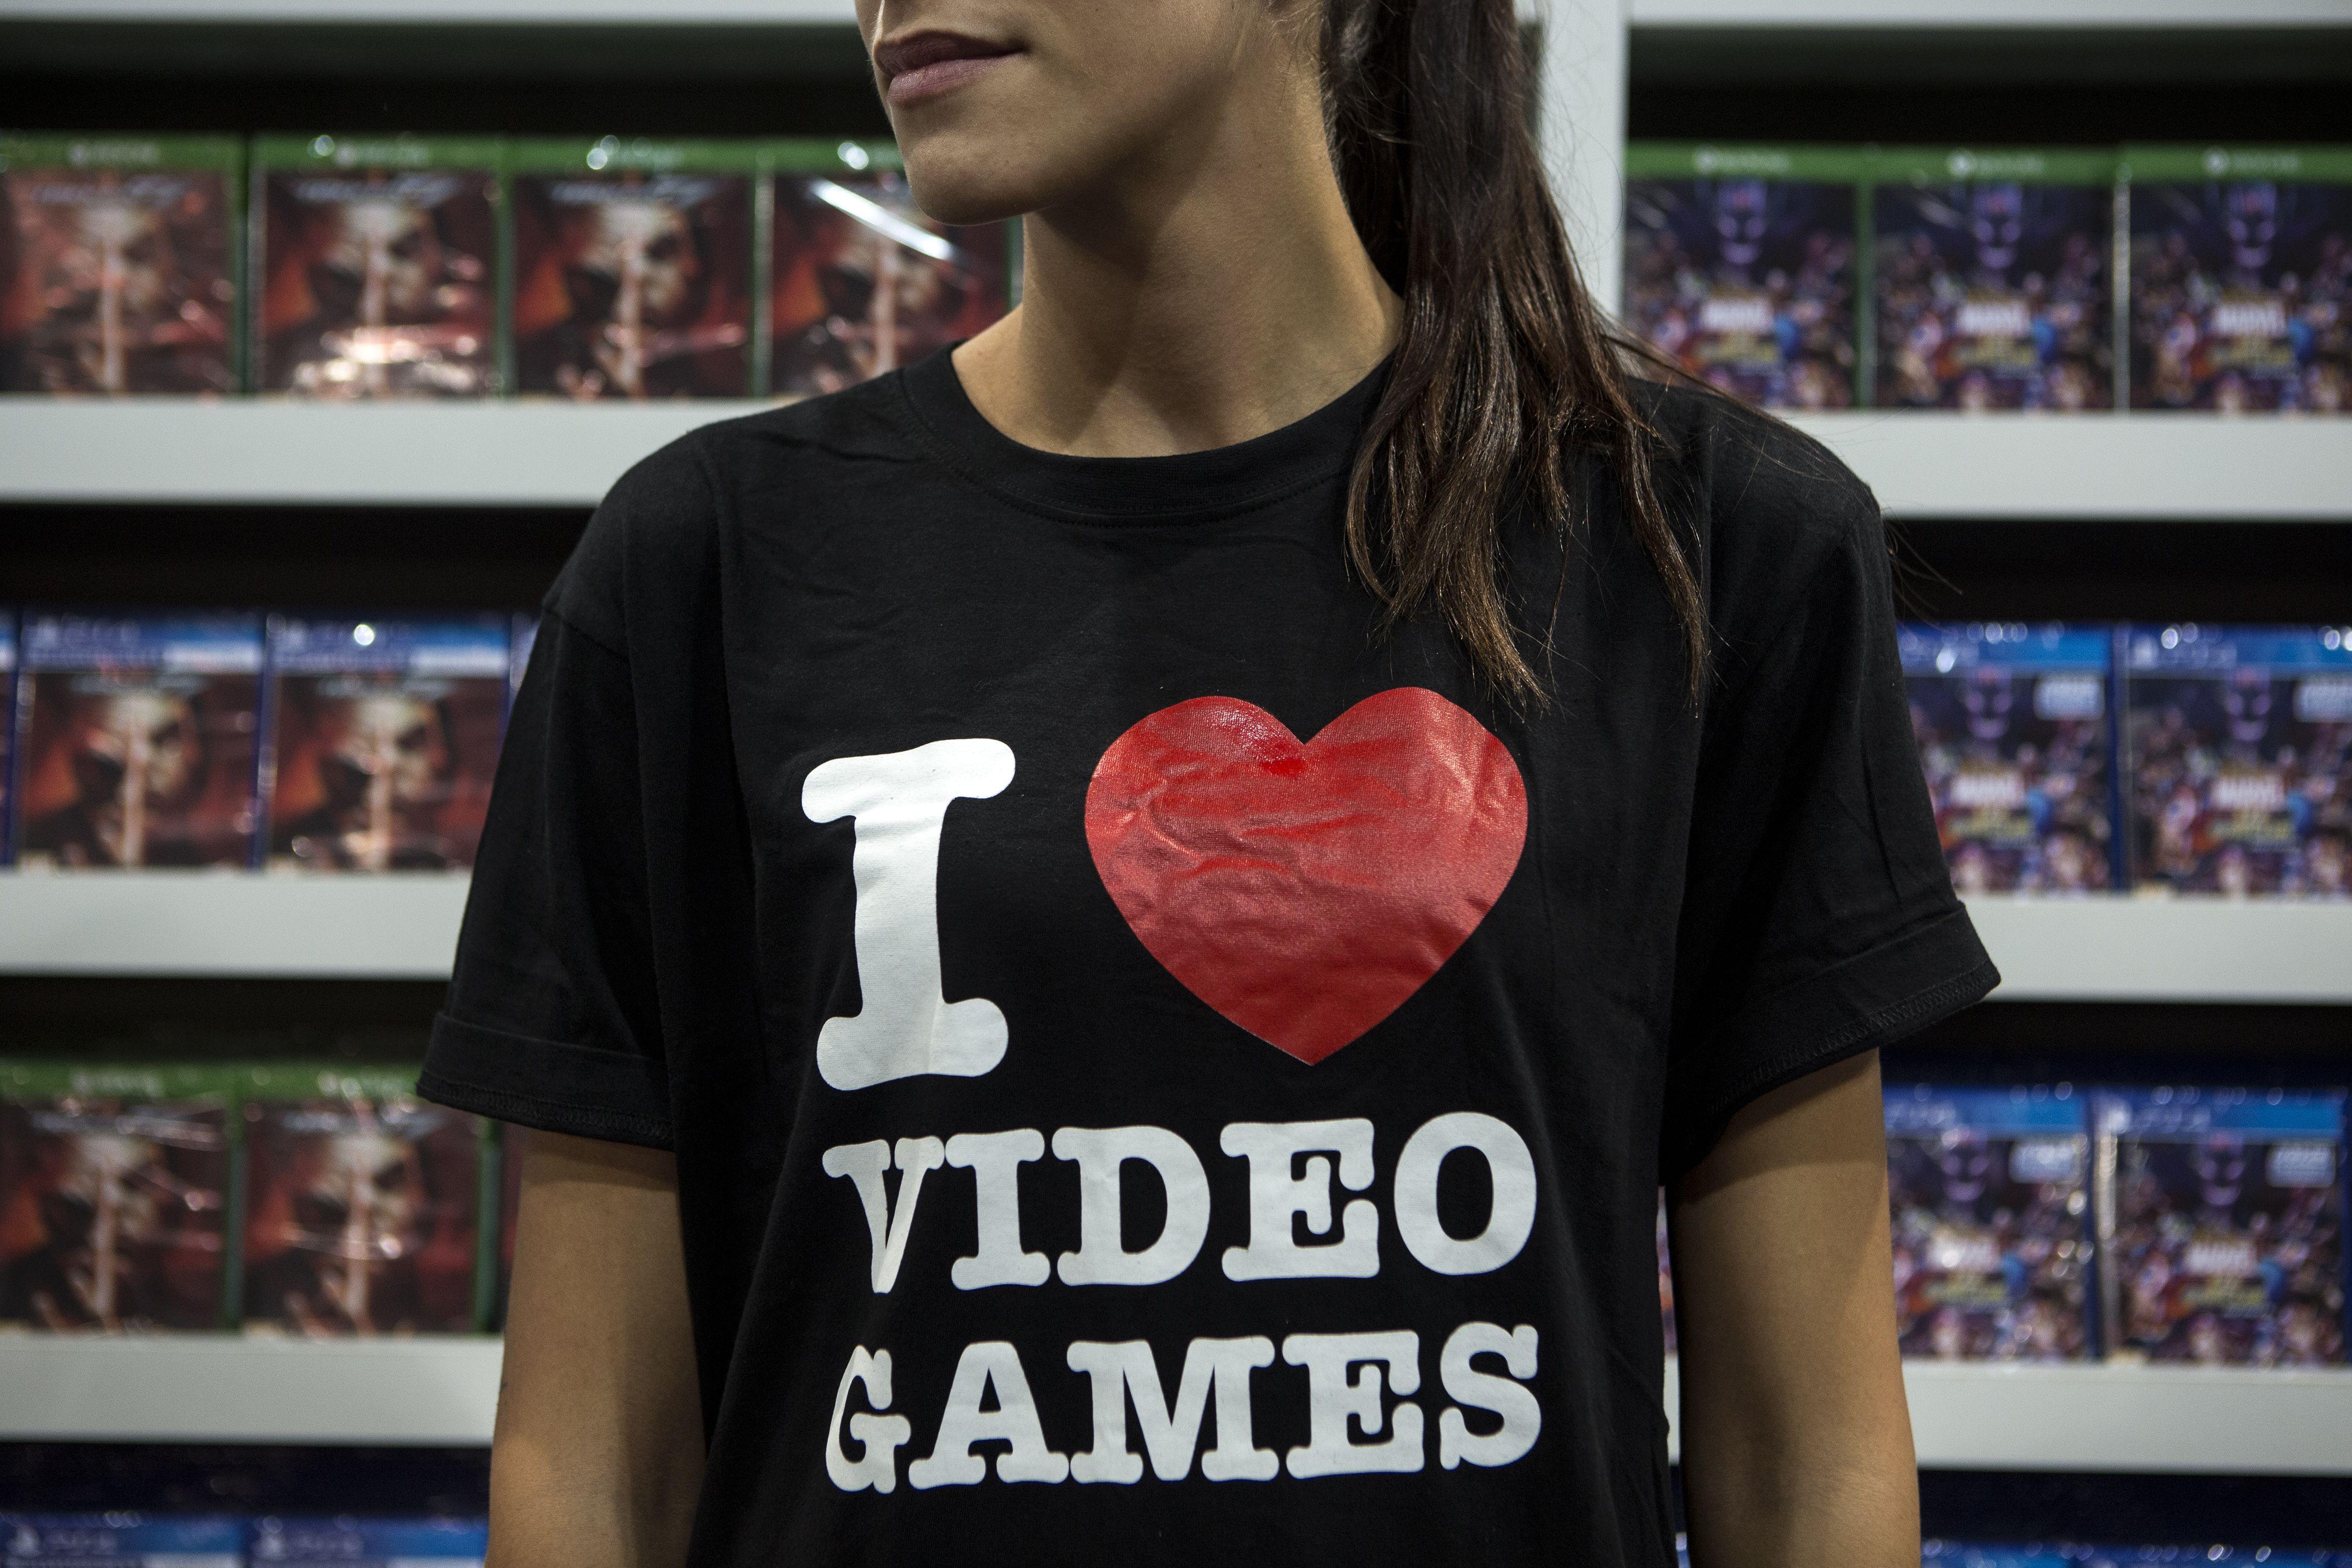 t-shirt reading 'I heart videogames'